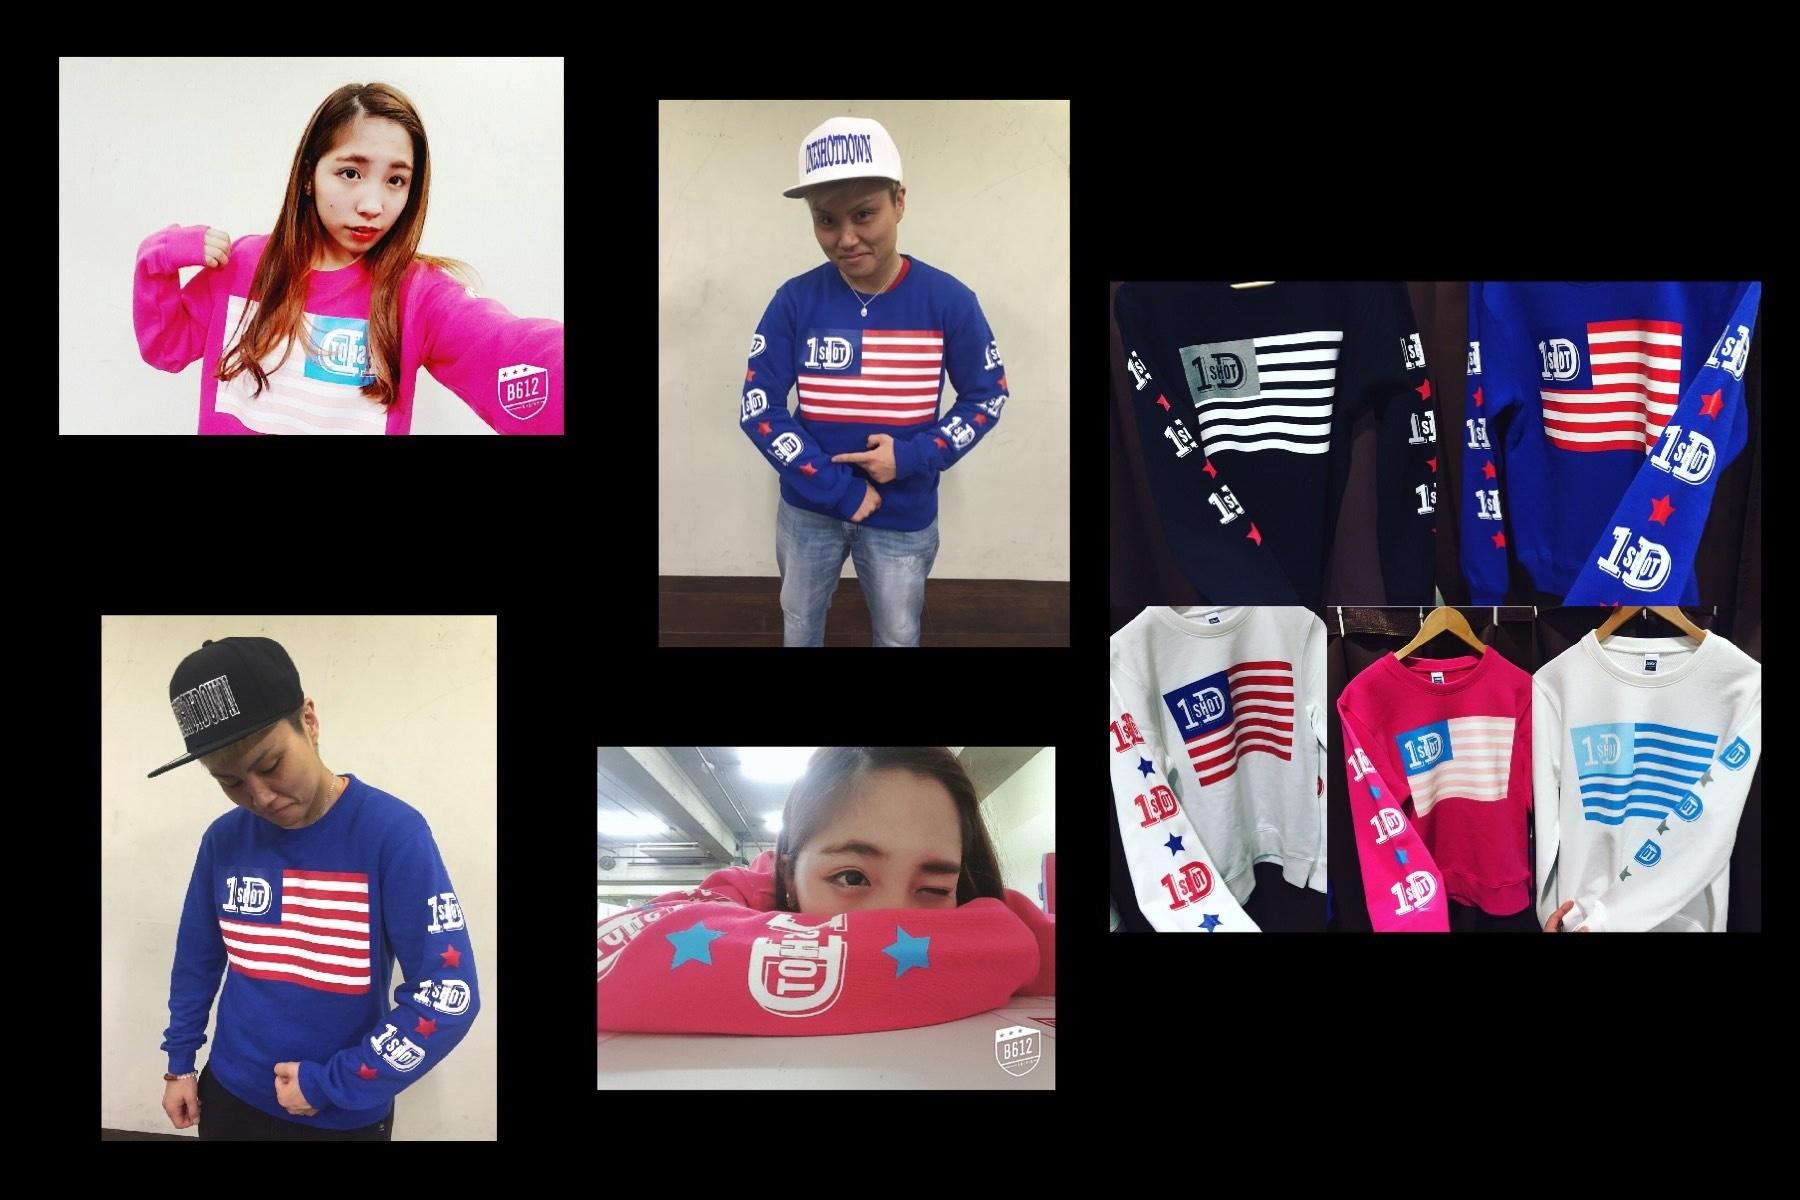 ONESHOTDOWN USA国旗デザイン クールネック スウェット - 画像4